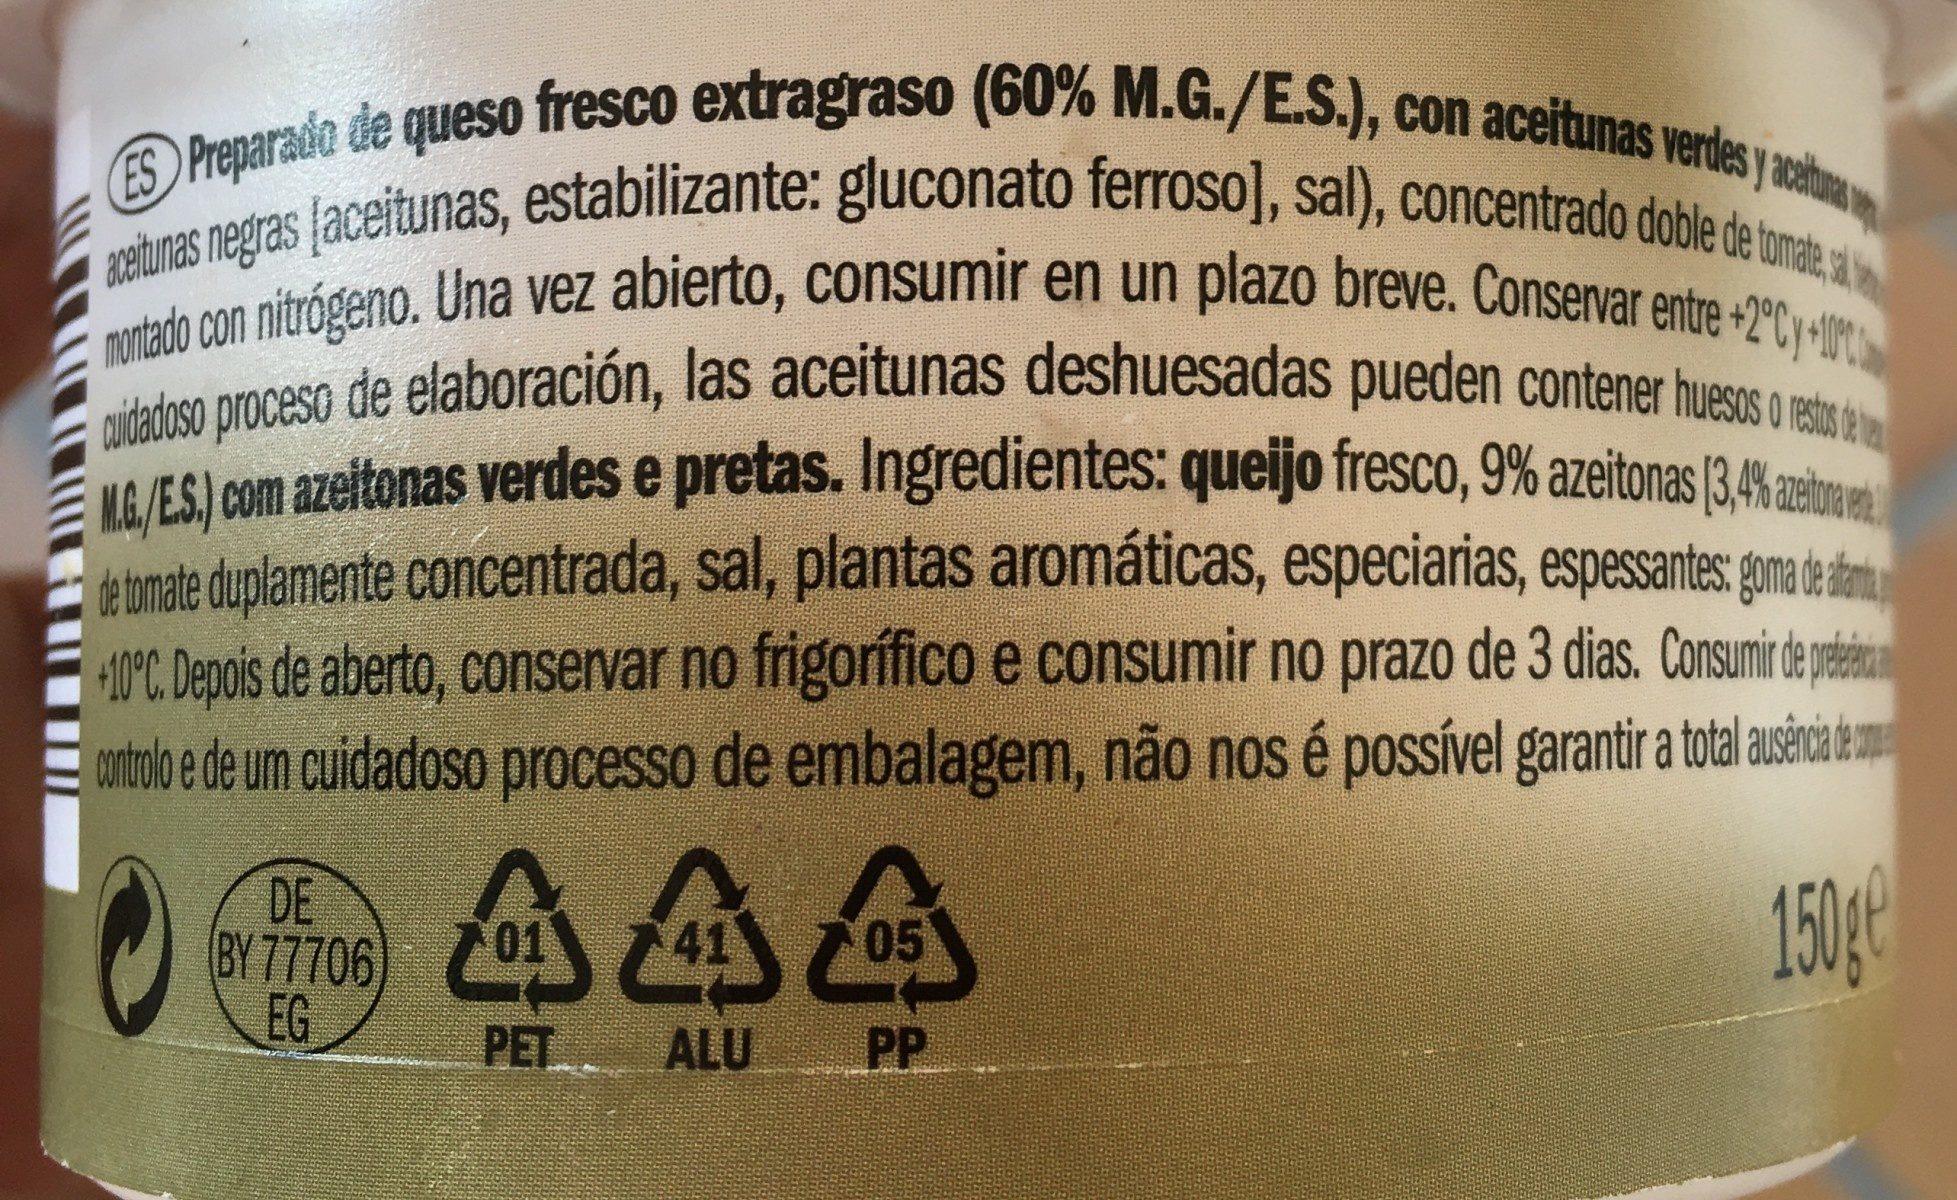 Aceitunas azeitonas - Ingrédients